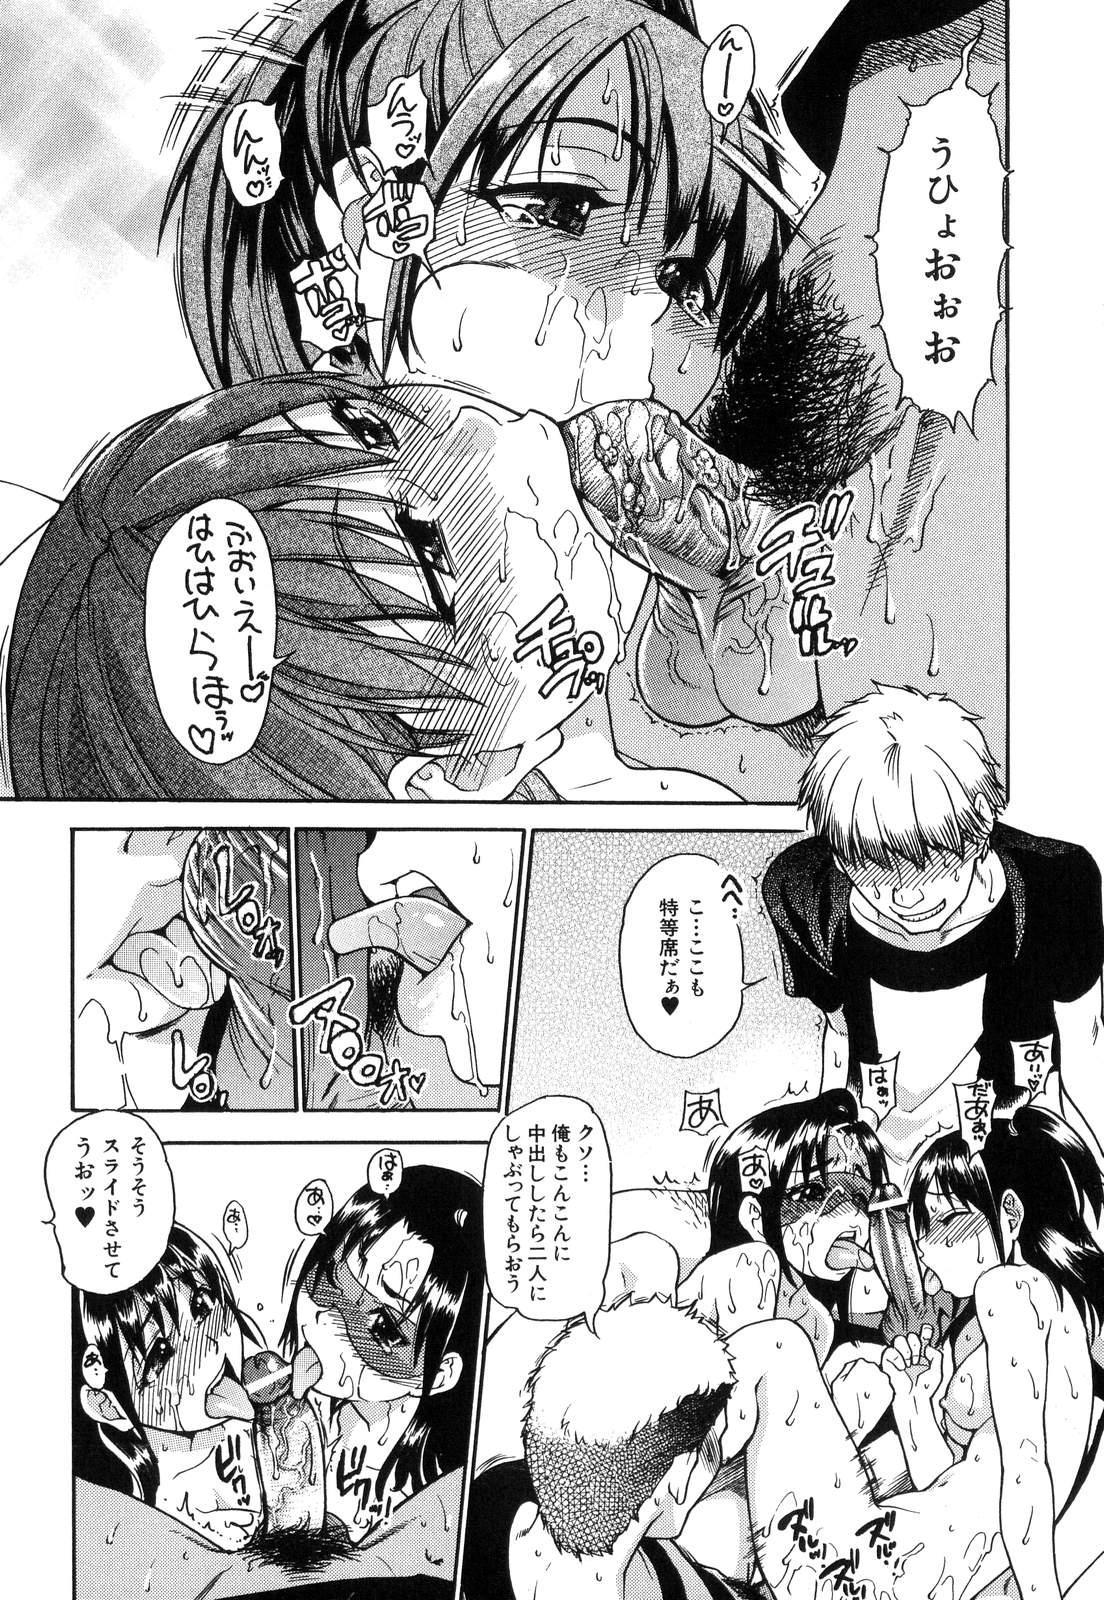 Shining Musume. 6. Rainbow Six 119